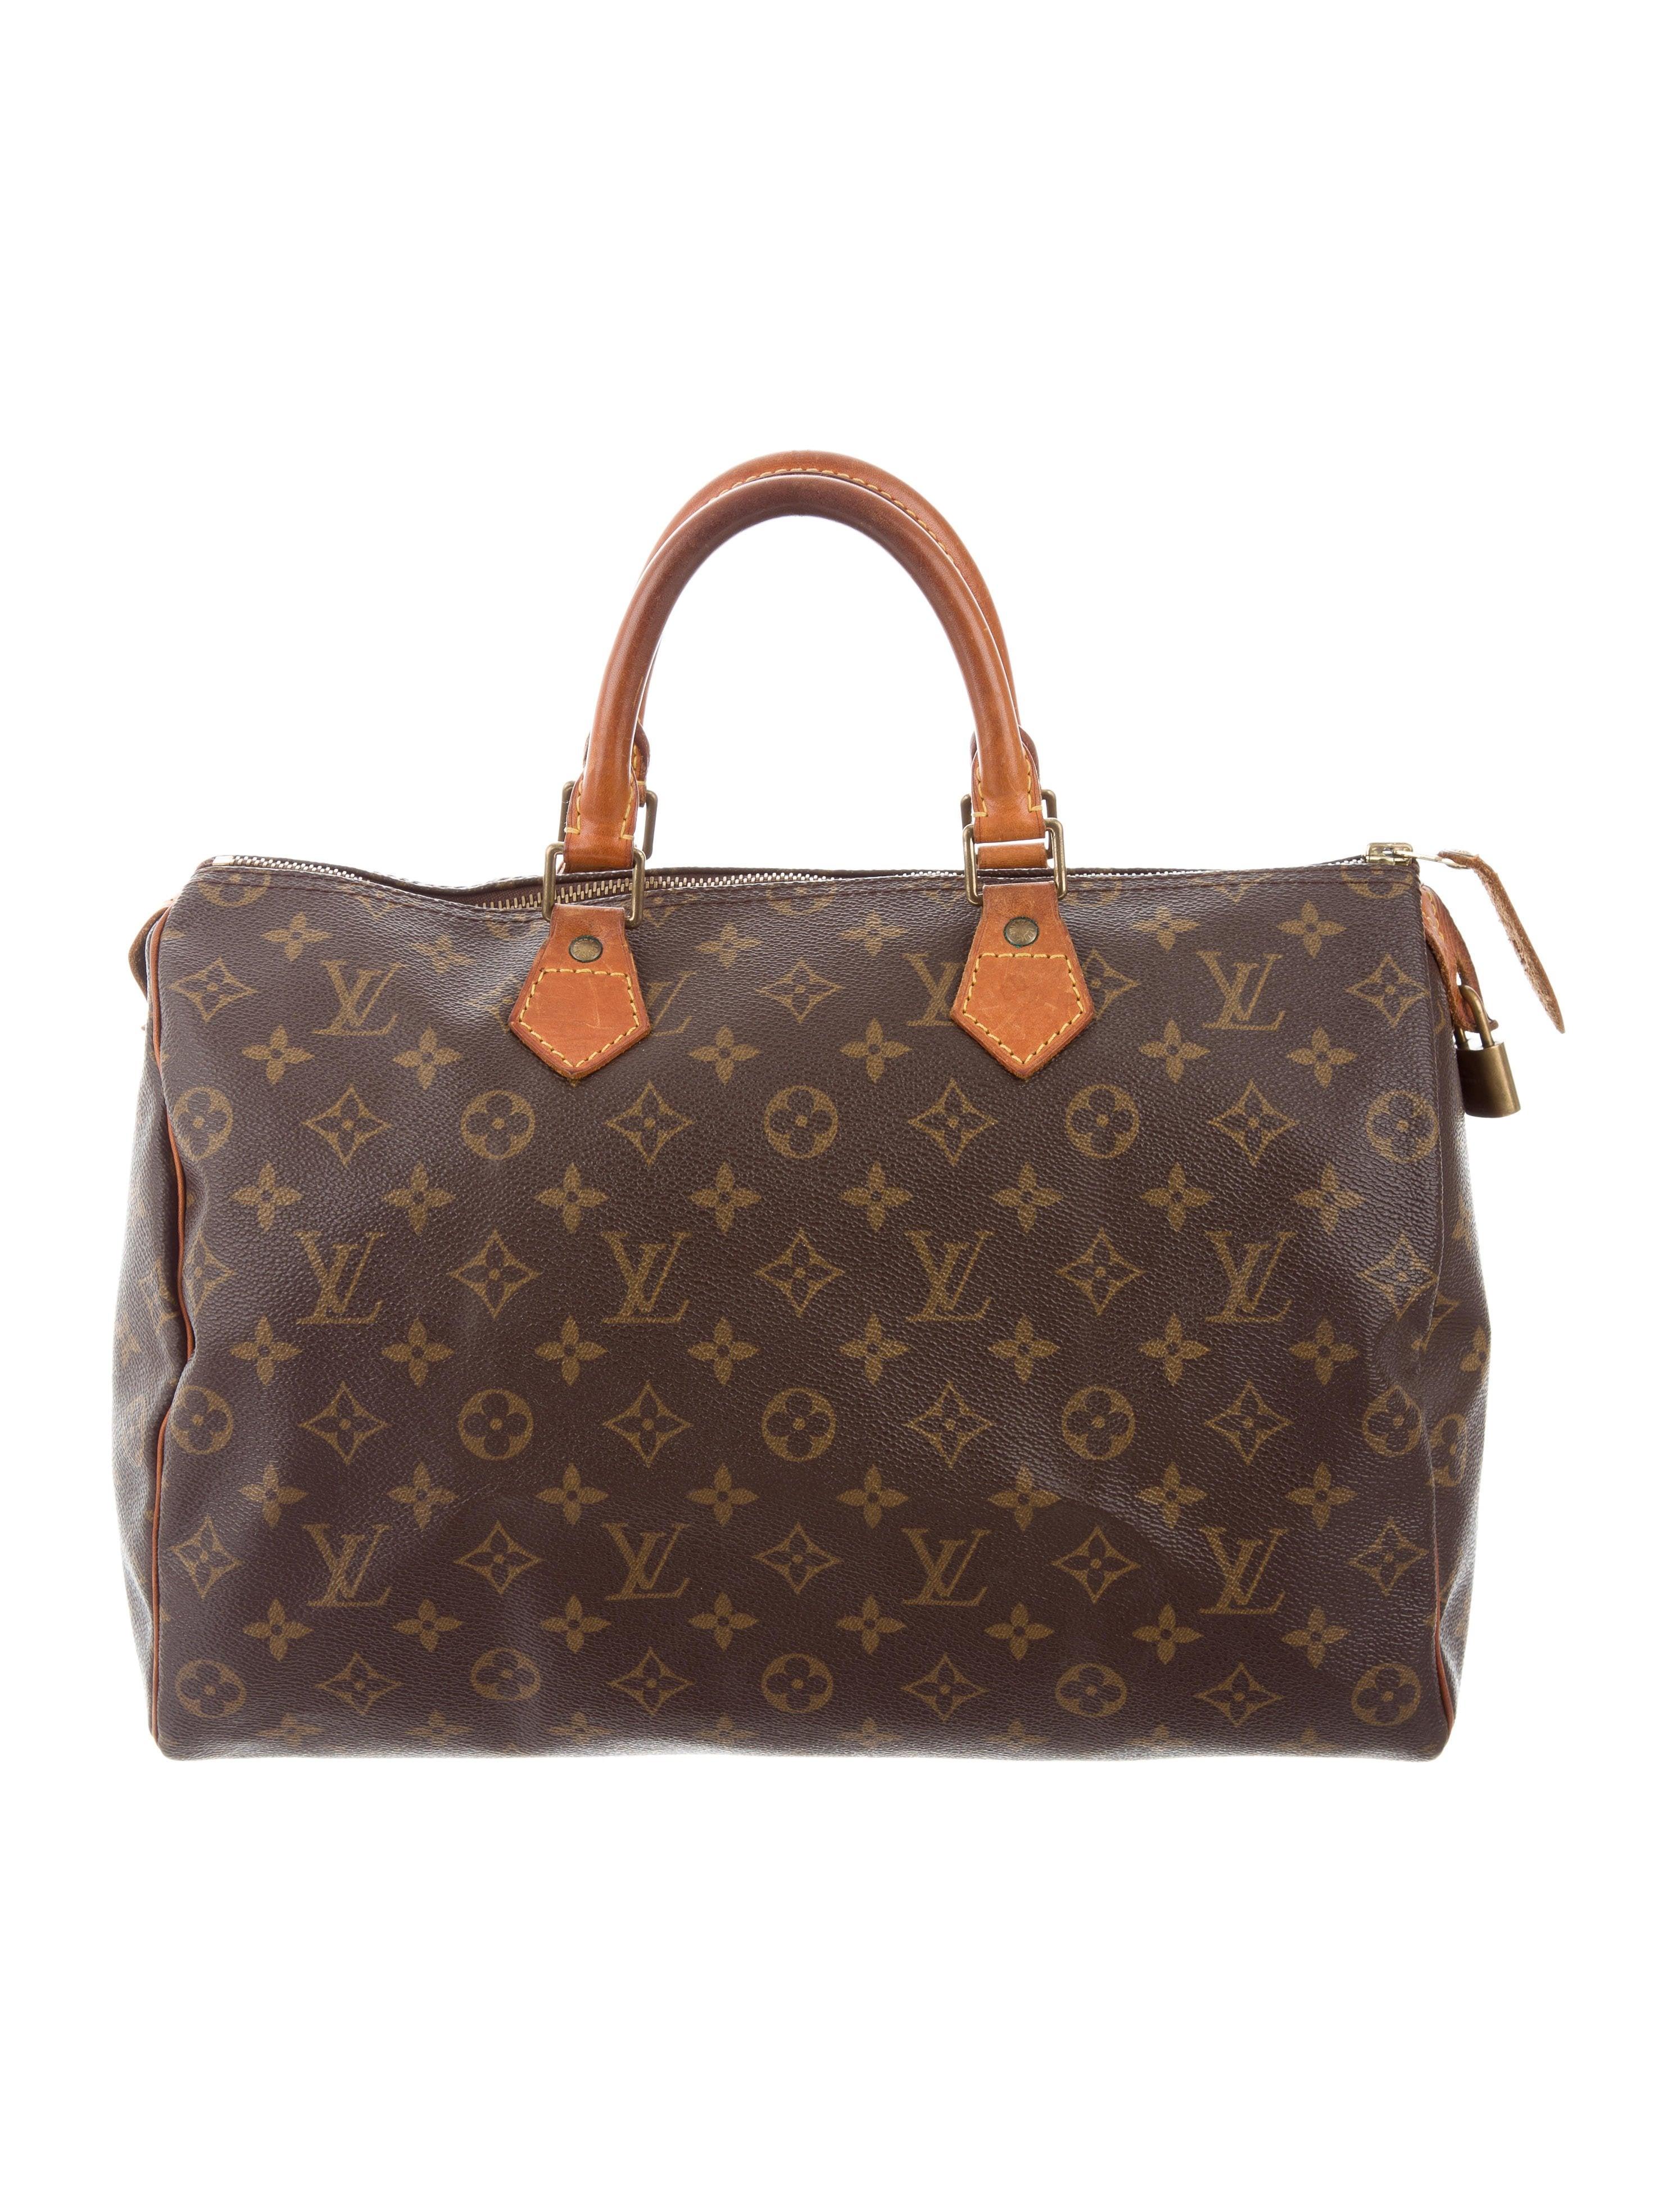 Louis vuitton monogram speedy 35 handbags lou126280 for Louis vuitton miroir speedy 35